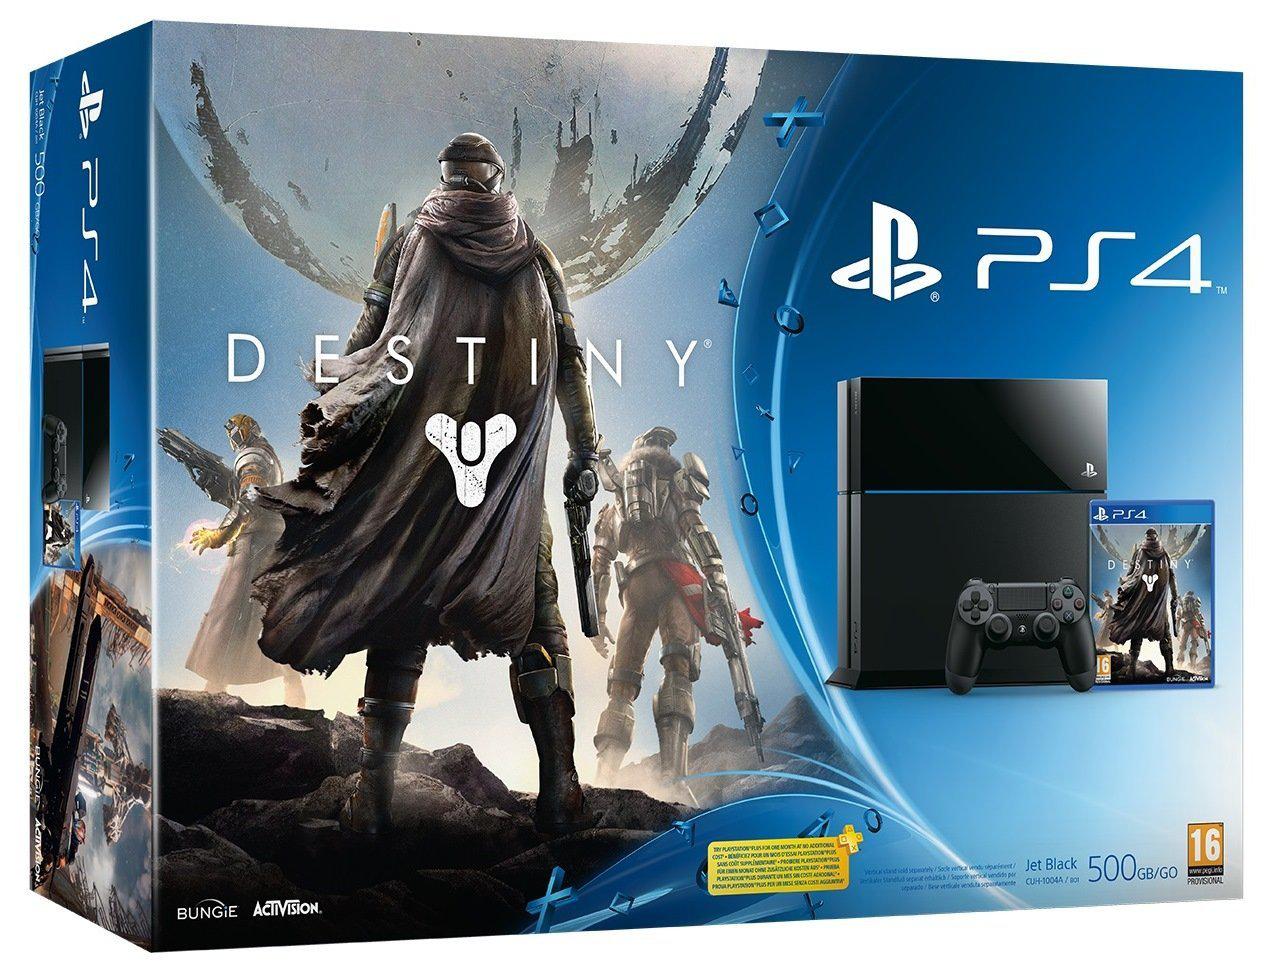 Console Sony PS4 + Destiny ou InFamouse Second Son ou The Last Of Us Remastered (+ 80€ en bon d'achat)